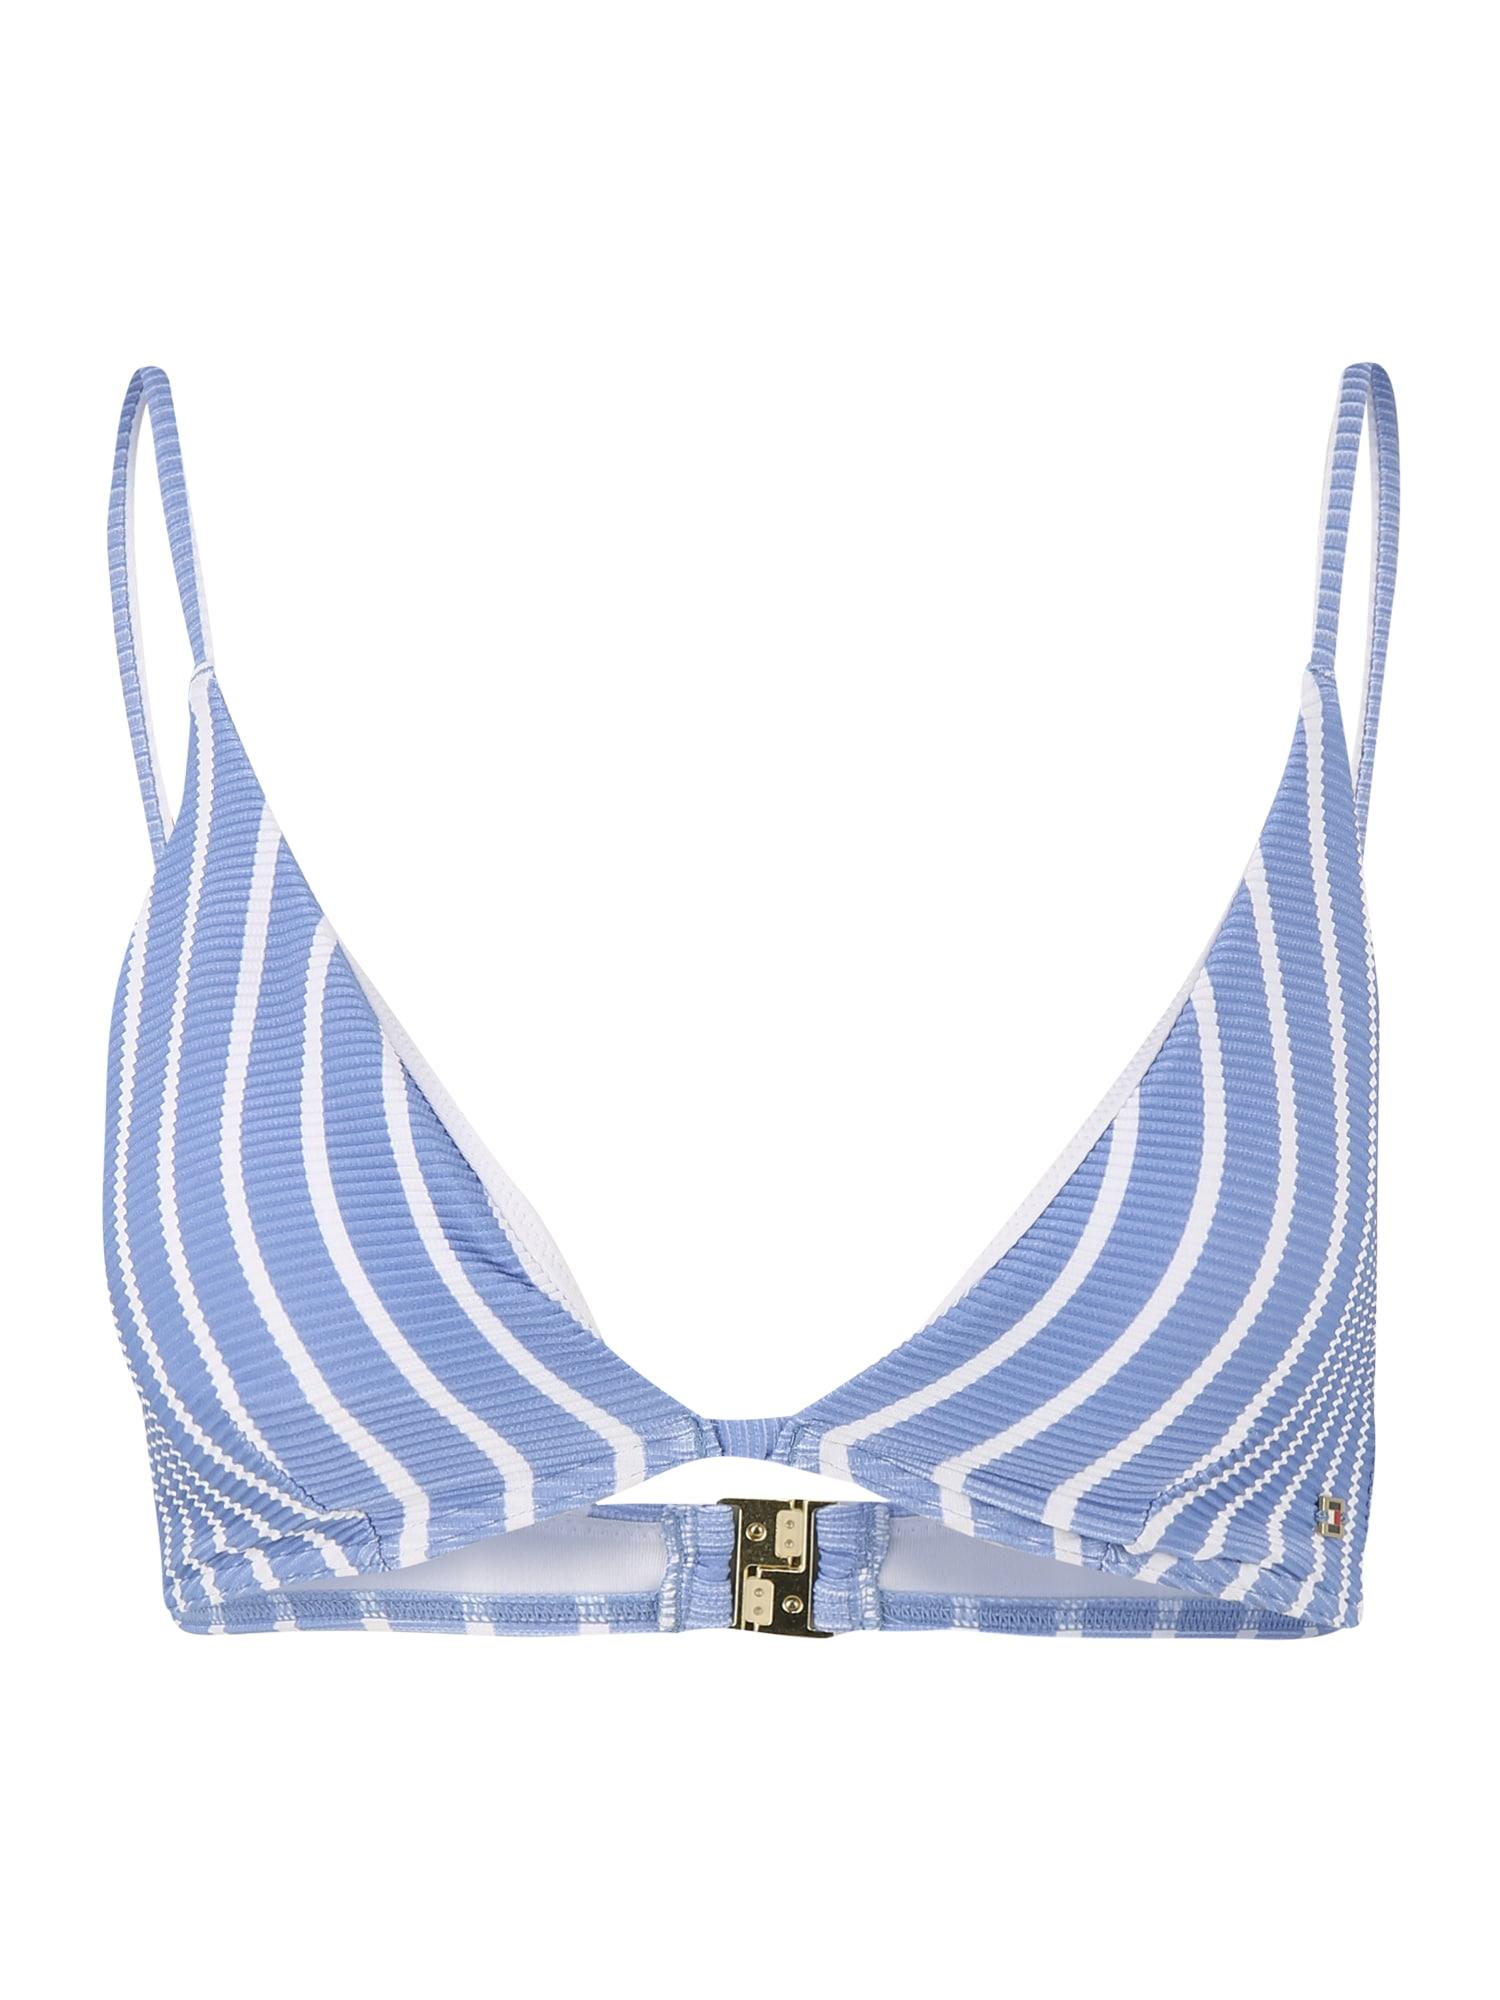 Tommy Hilfiger Underwear Bikinio viršutinė dalis mėlyna dūmų spalva / balta